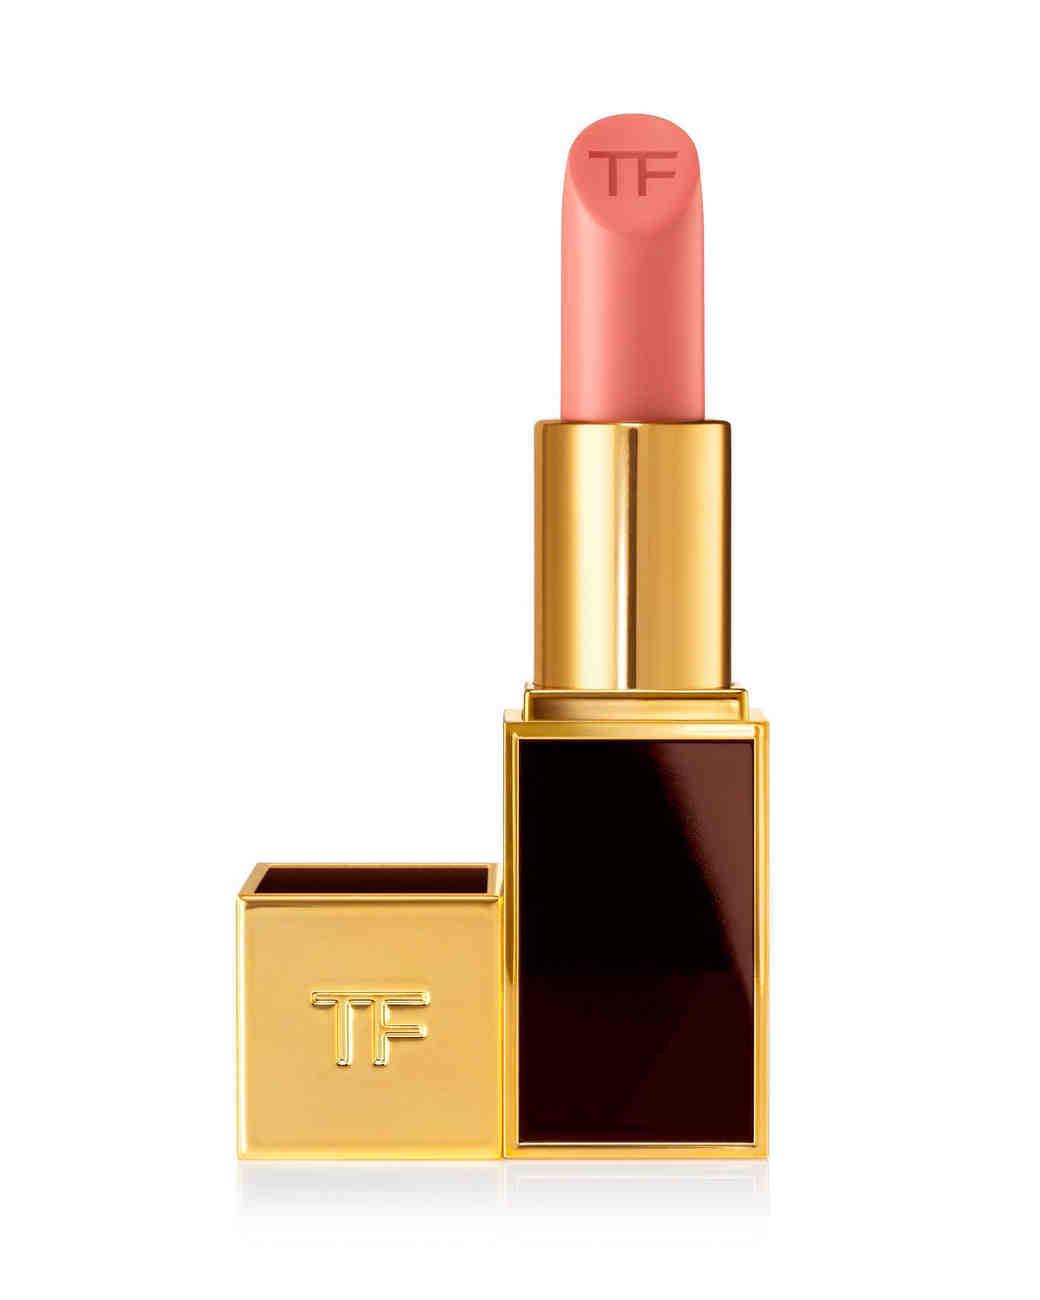 matte-lipsticks-tom-ford-lip-color-matte-0915.jpg